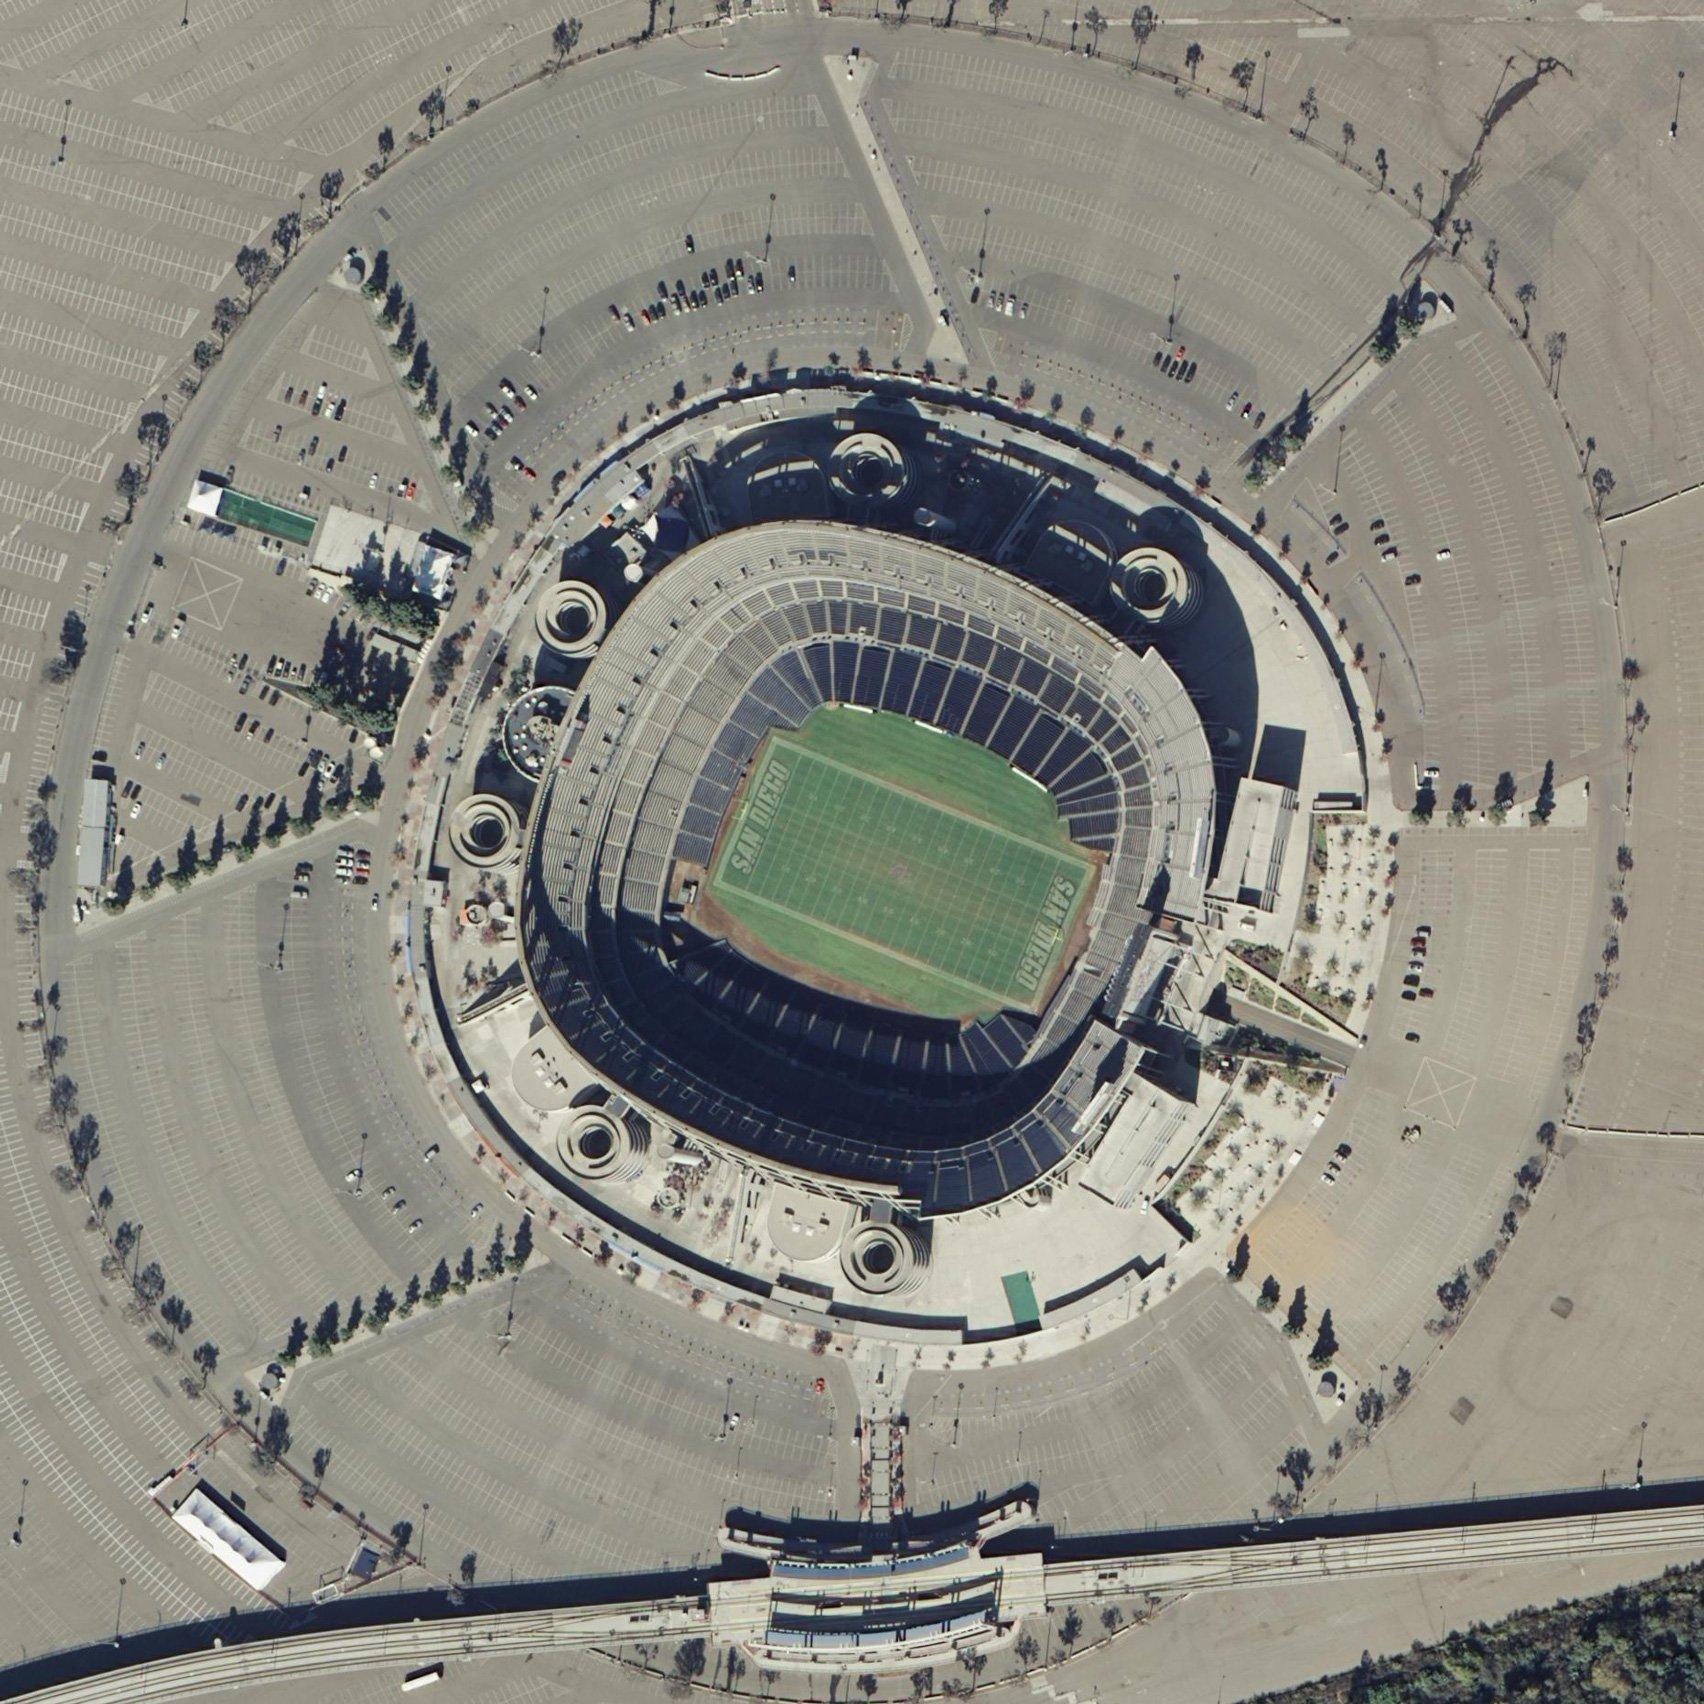 Qualcomm Stadium by Gary Allen, San Diego, California